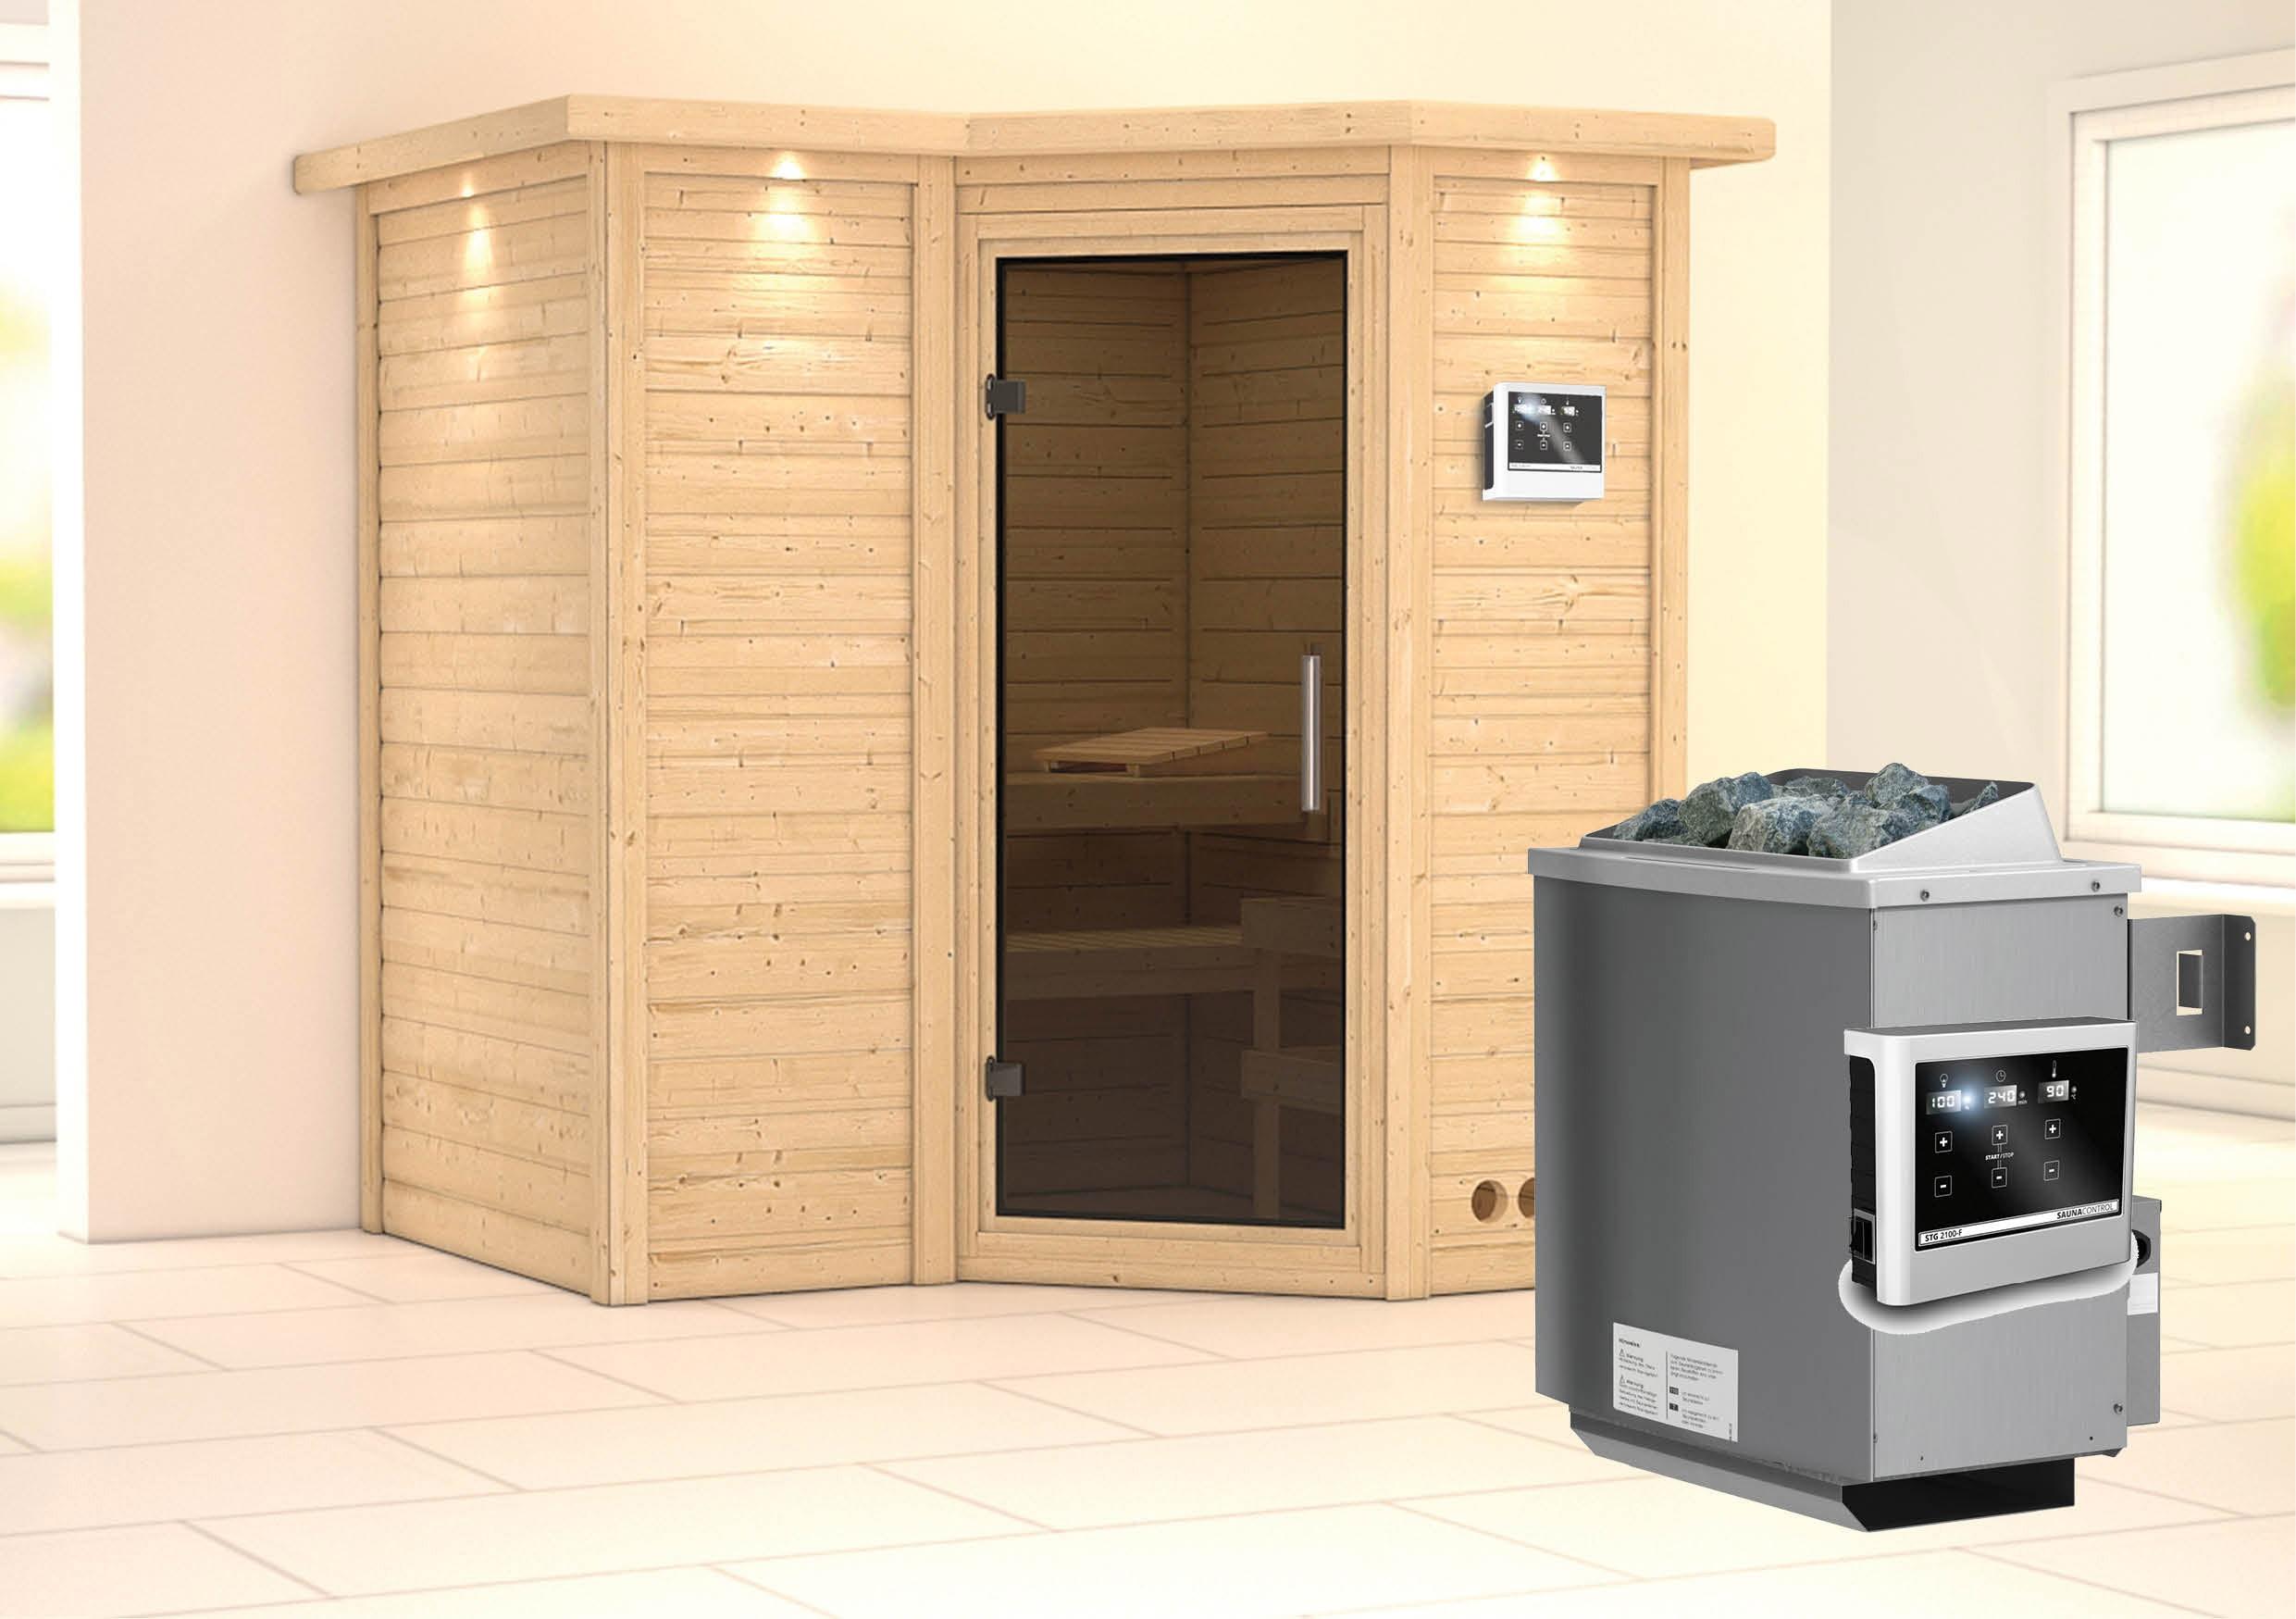 Karibu Sauna Sahib 1 40mm Dachkranz + Ofen 9kW extern moderne Tür Bild 1